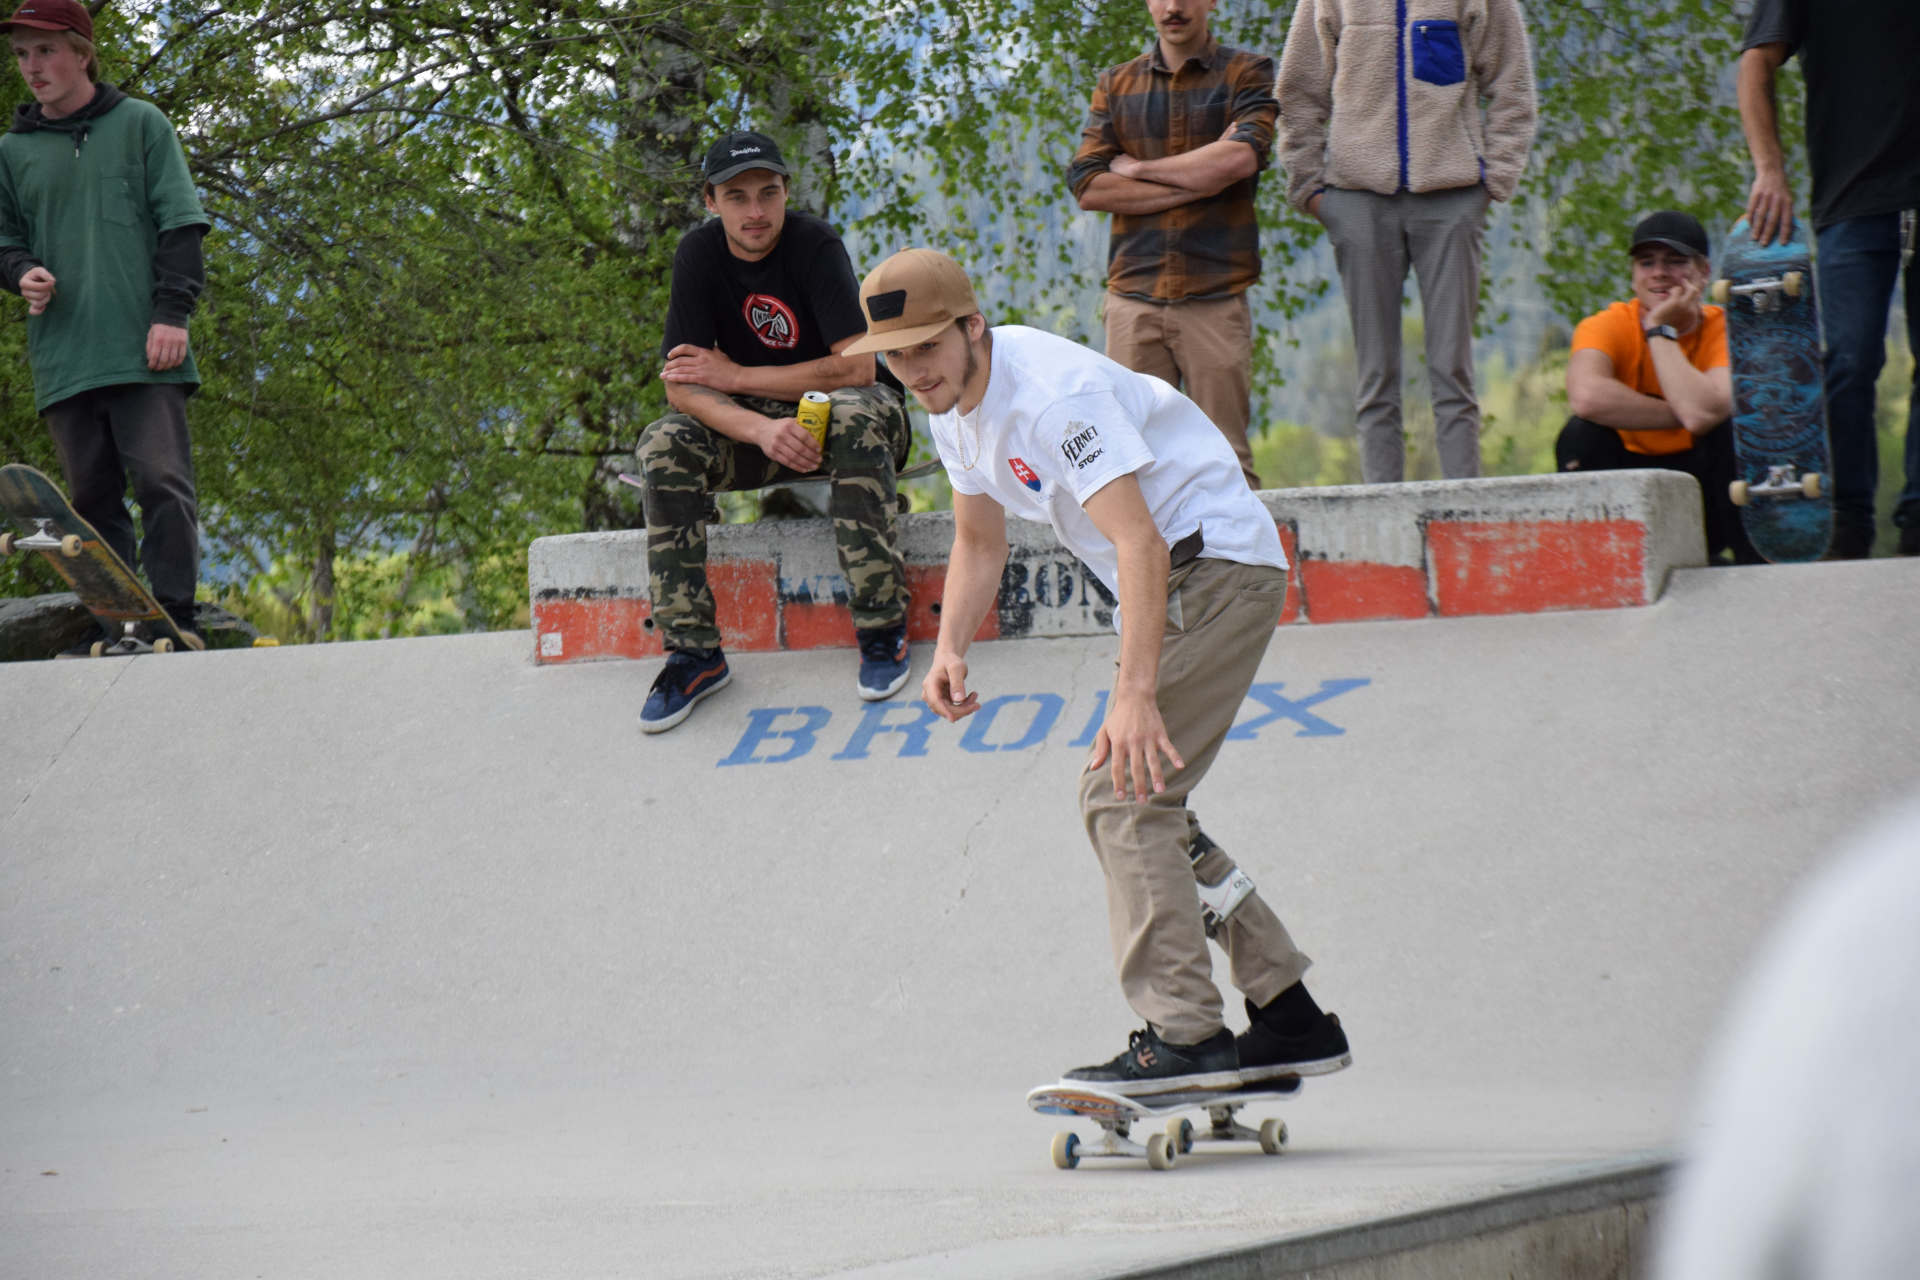 skateboard headz fieberbrunn kgt kitz gau trophy 2019 saalfelden00059